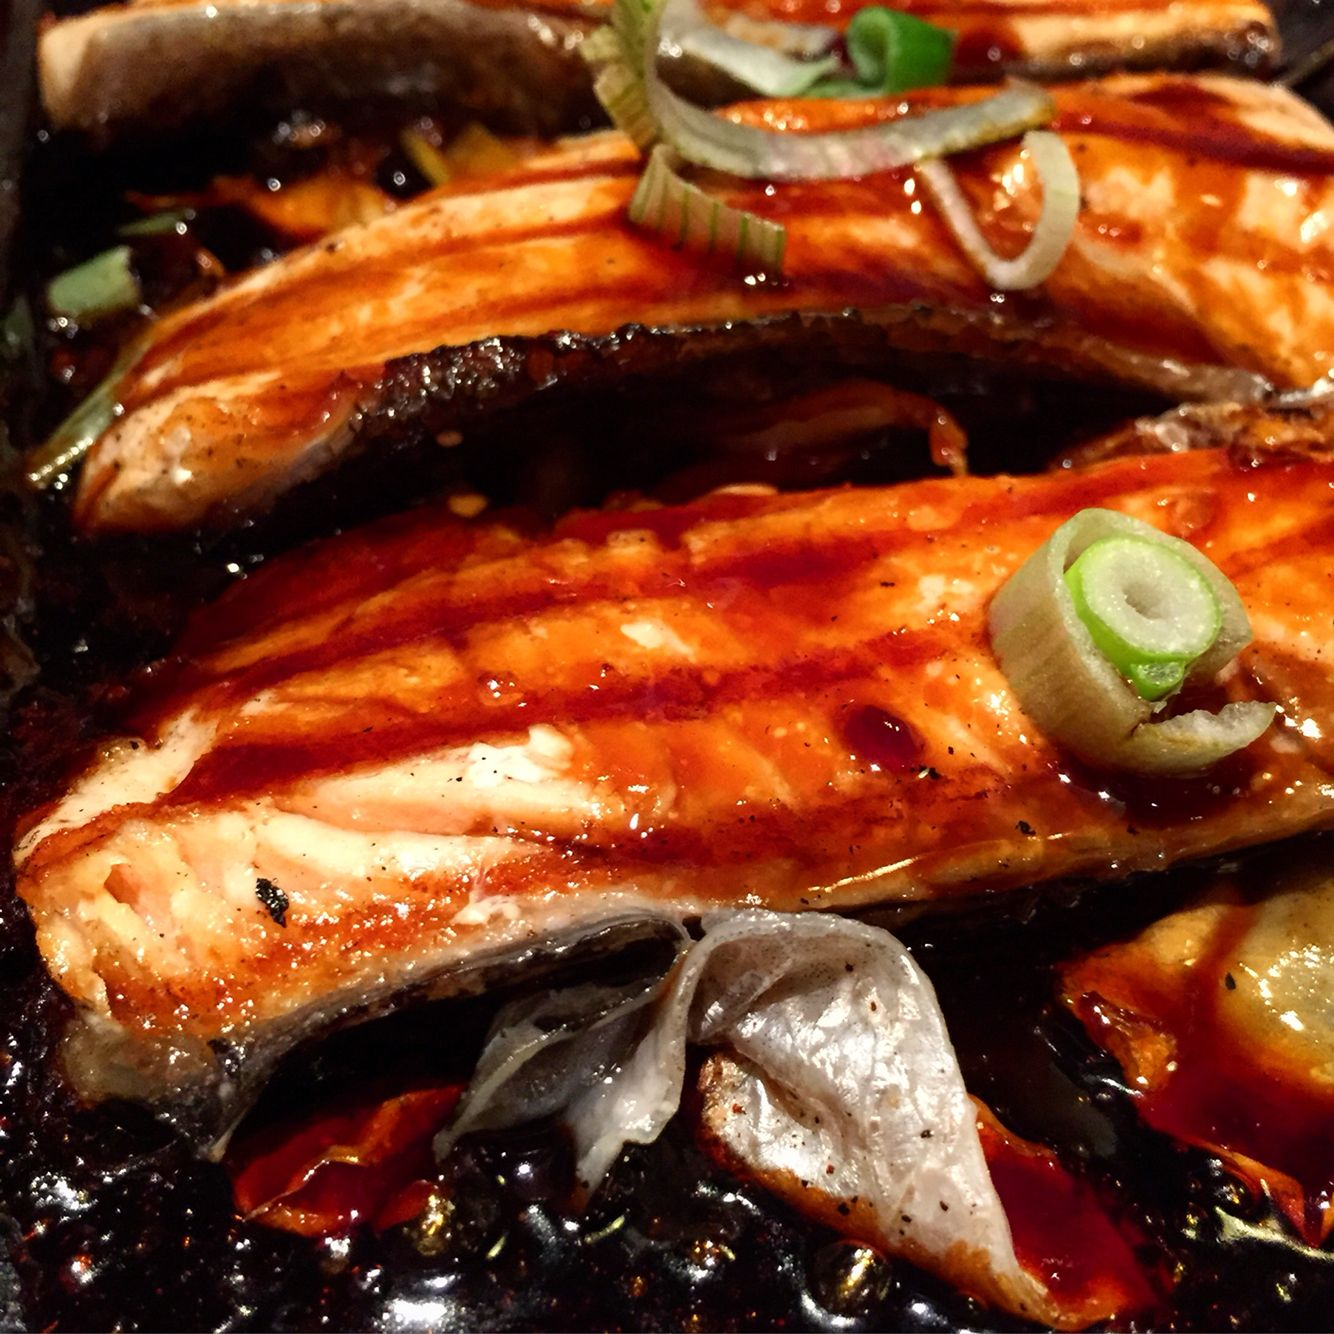 Salmon Teriaky @Bento Ramen (Japanese food)